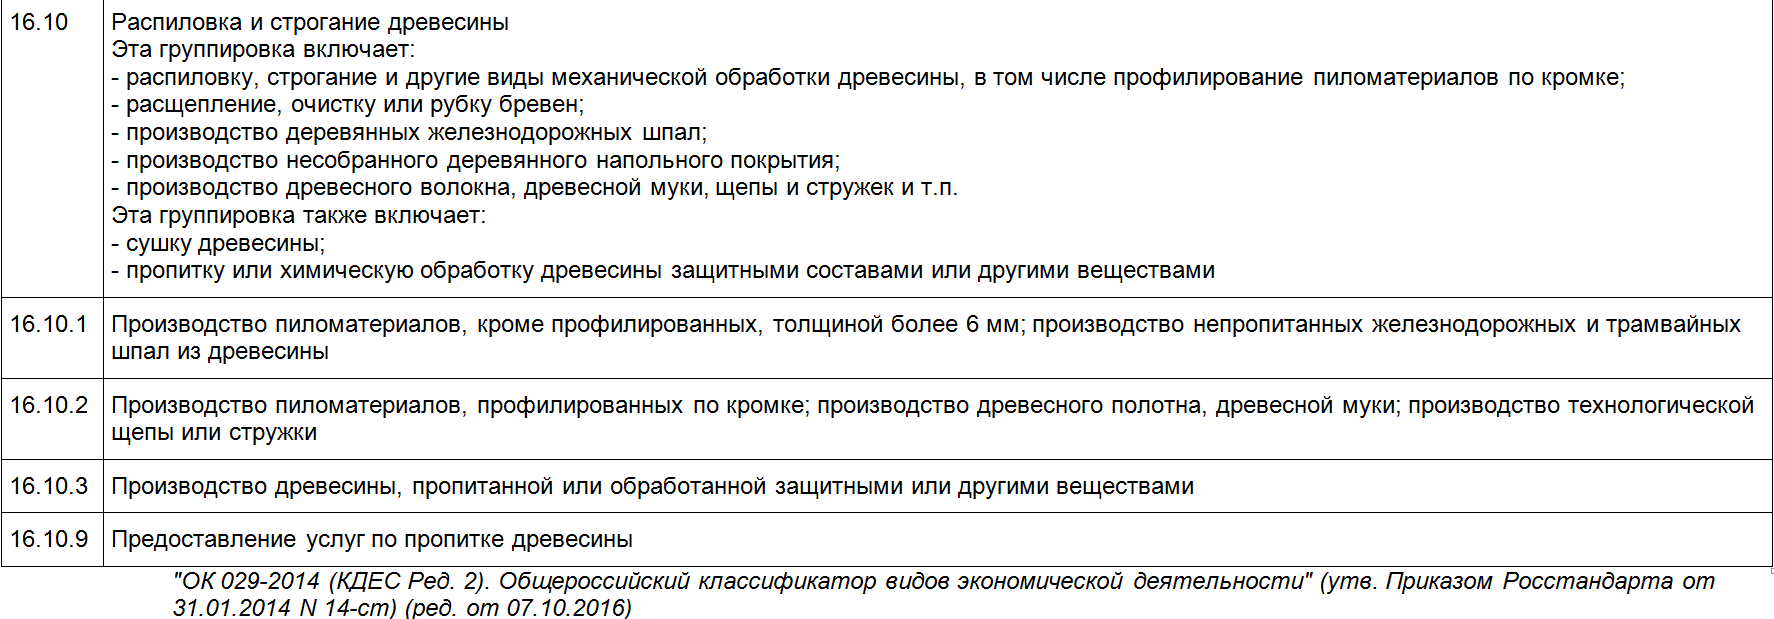 расшифровка ОКВЭД 16.10